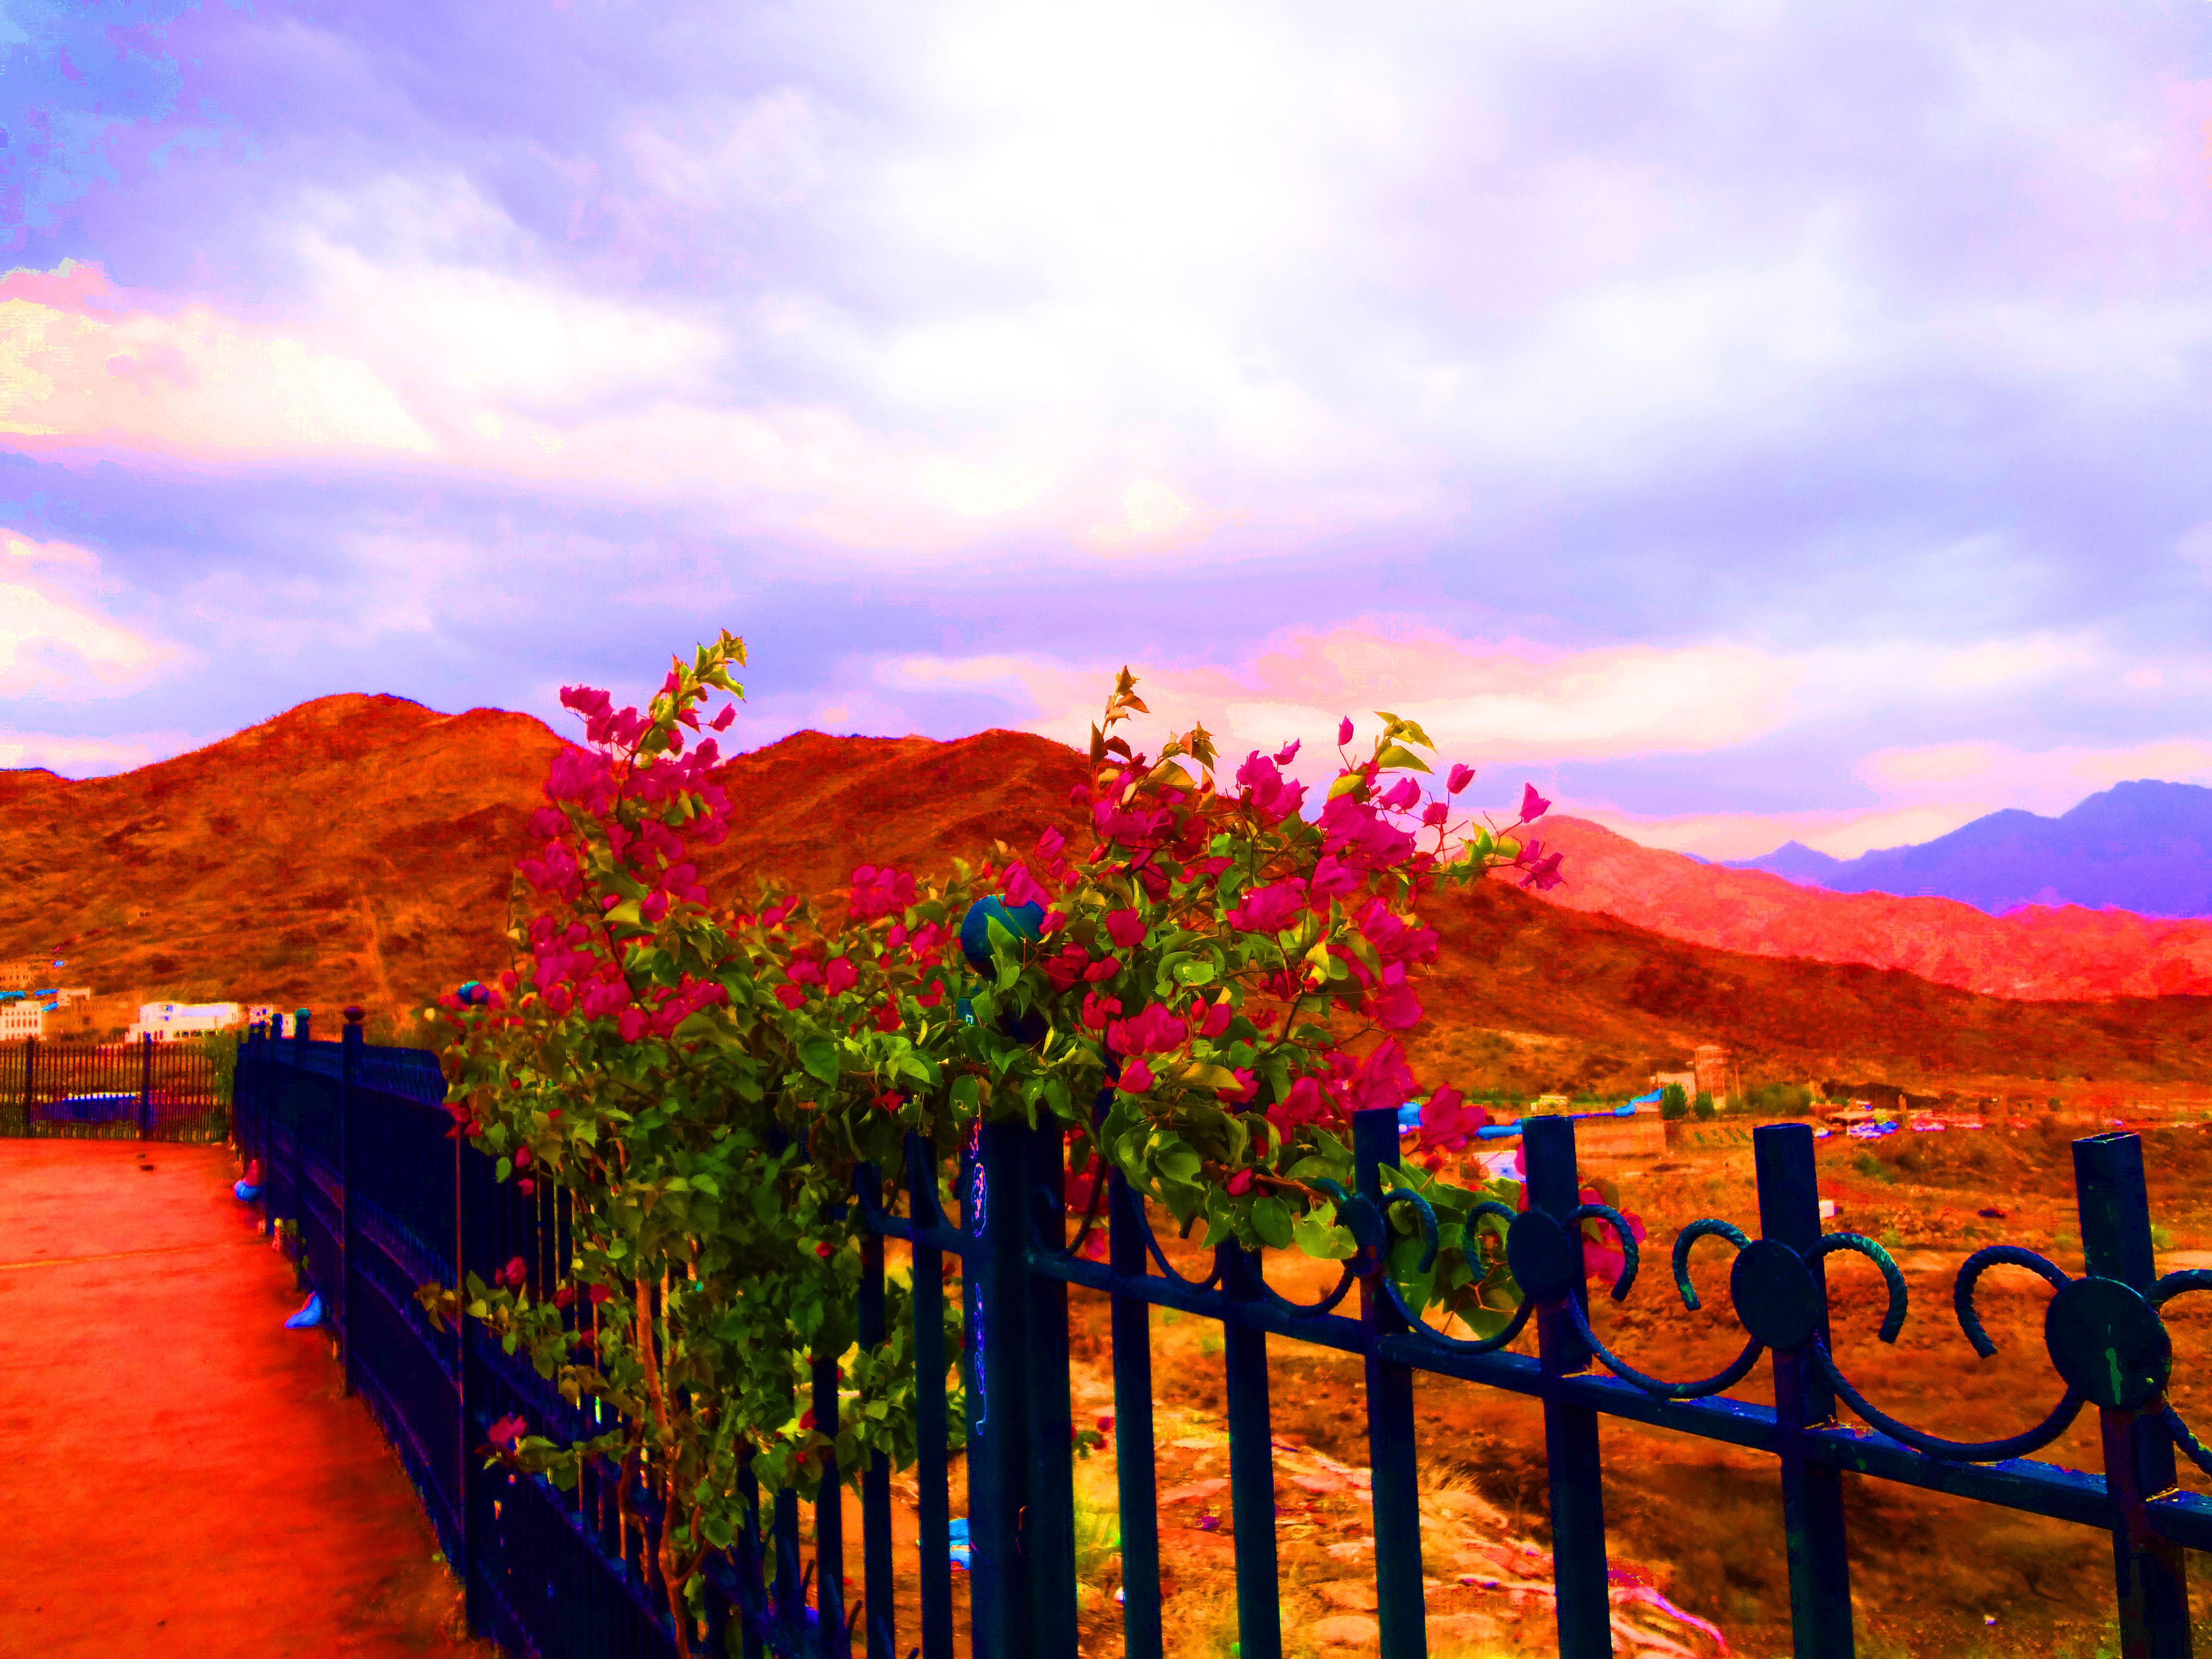 Al Turki Resort Al Hada 14 Best Taif Saudi Arabia Images On Pinterest Saudi Arabia